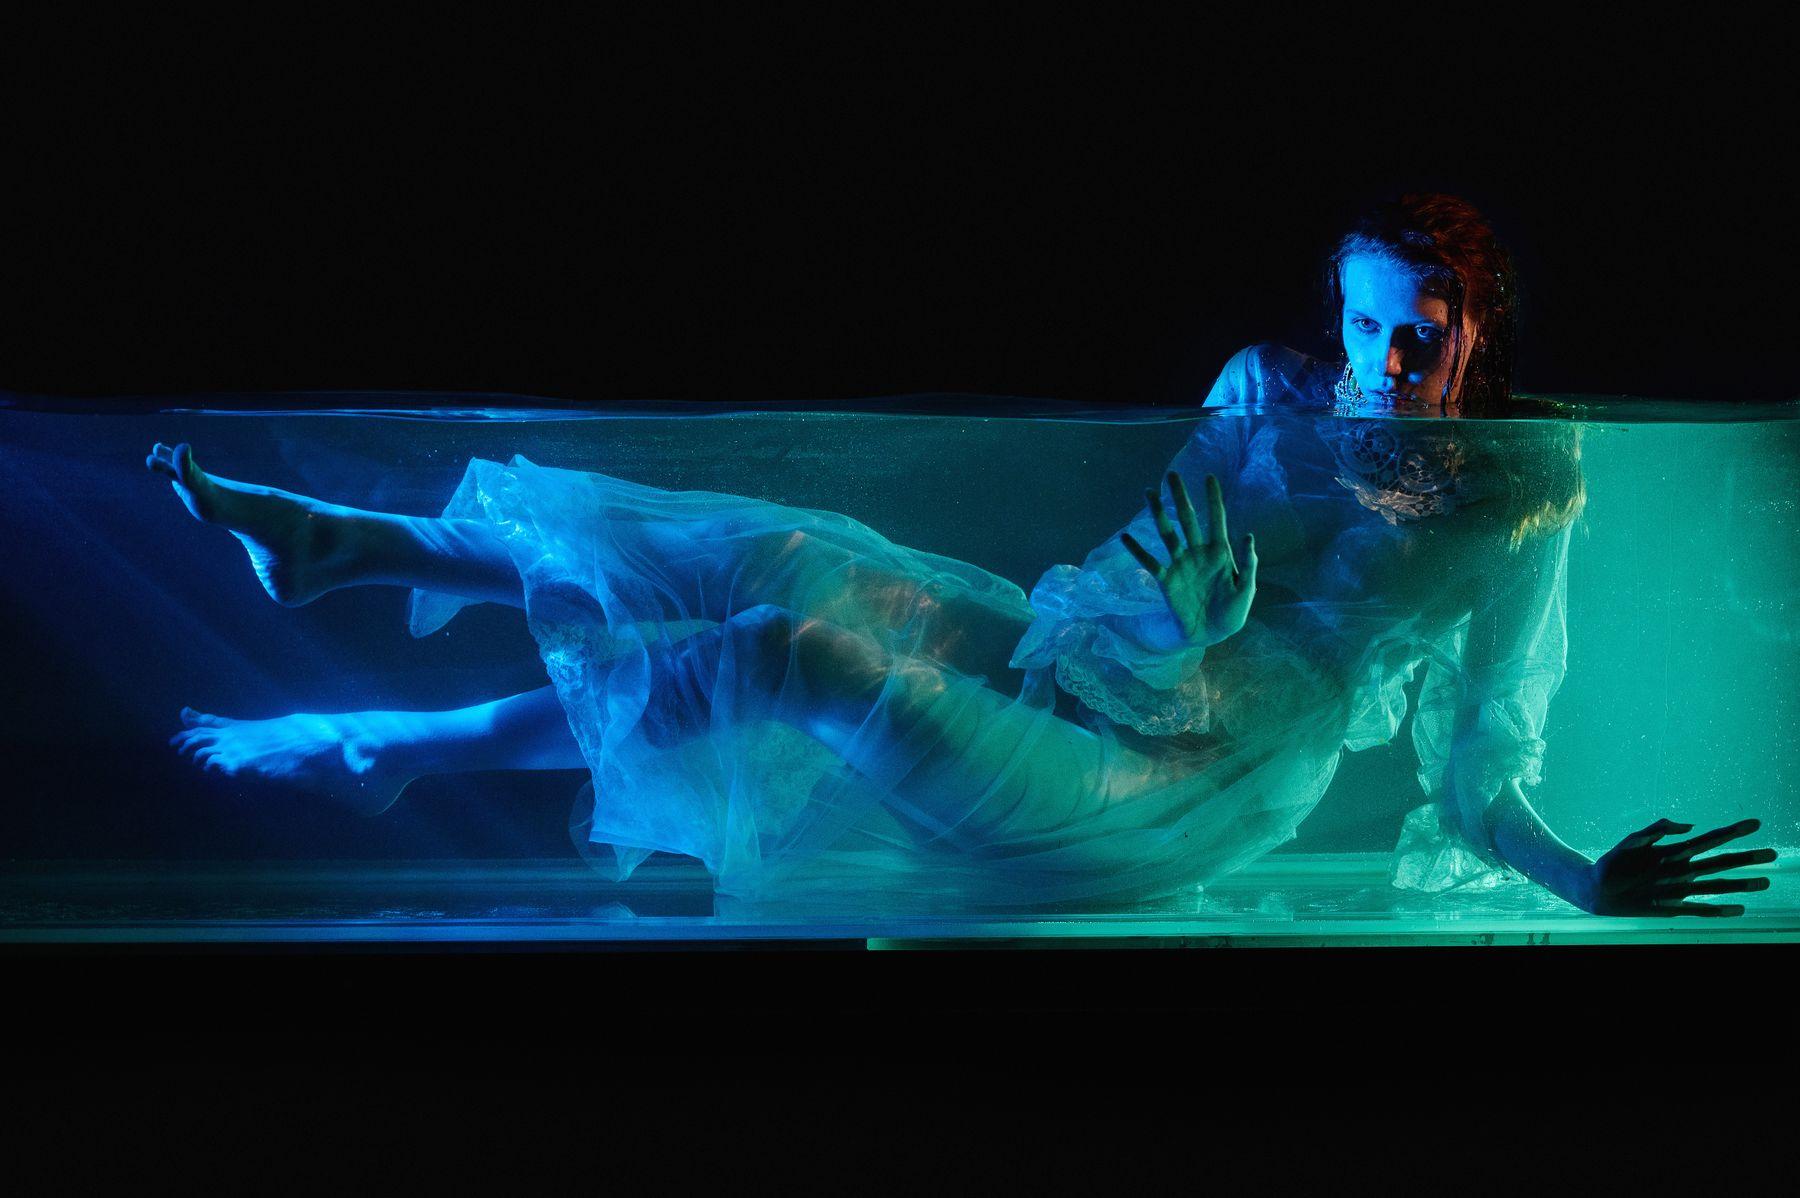 Amphitrite вода подводой девушка платье fashion портрет nikon z6ii dedolight underwater модель